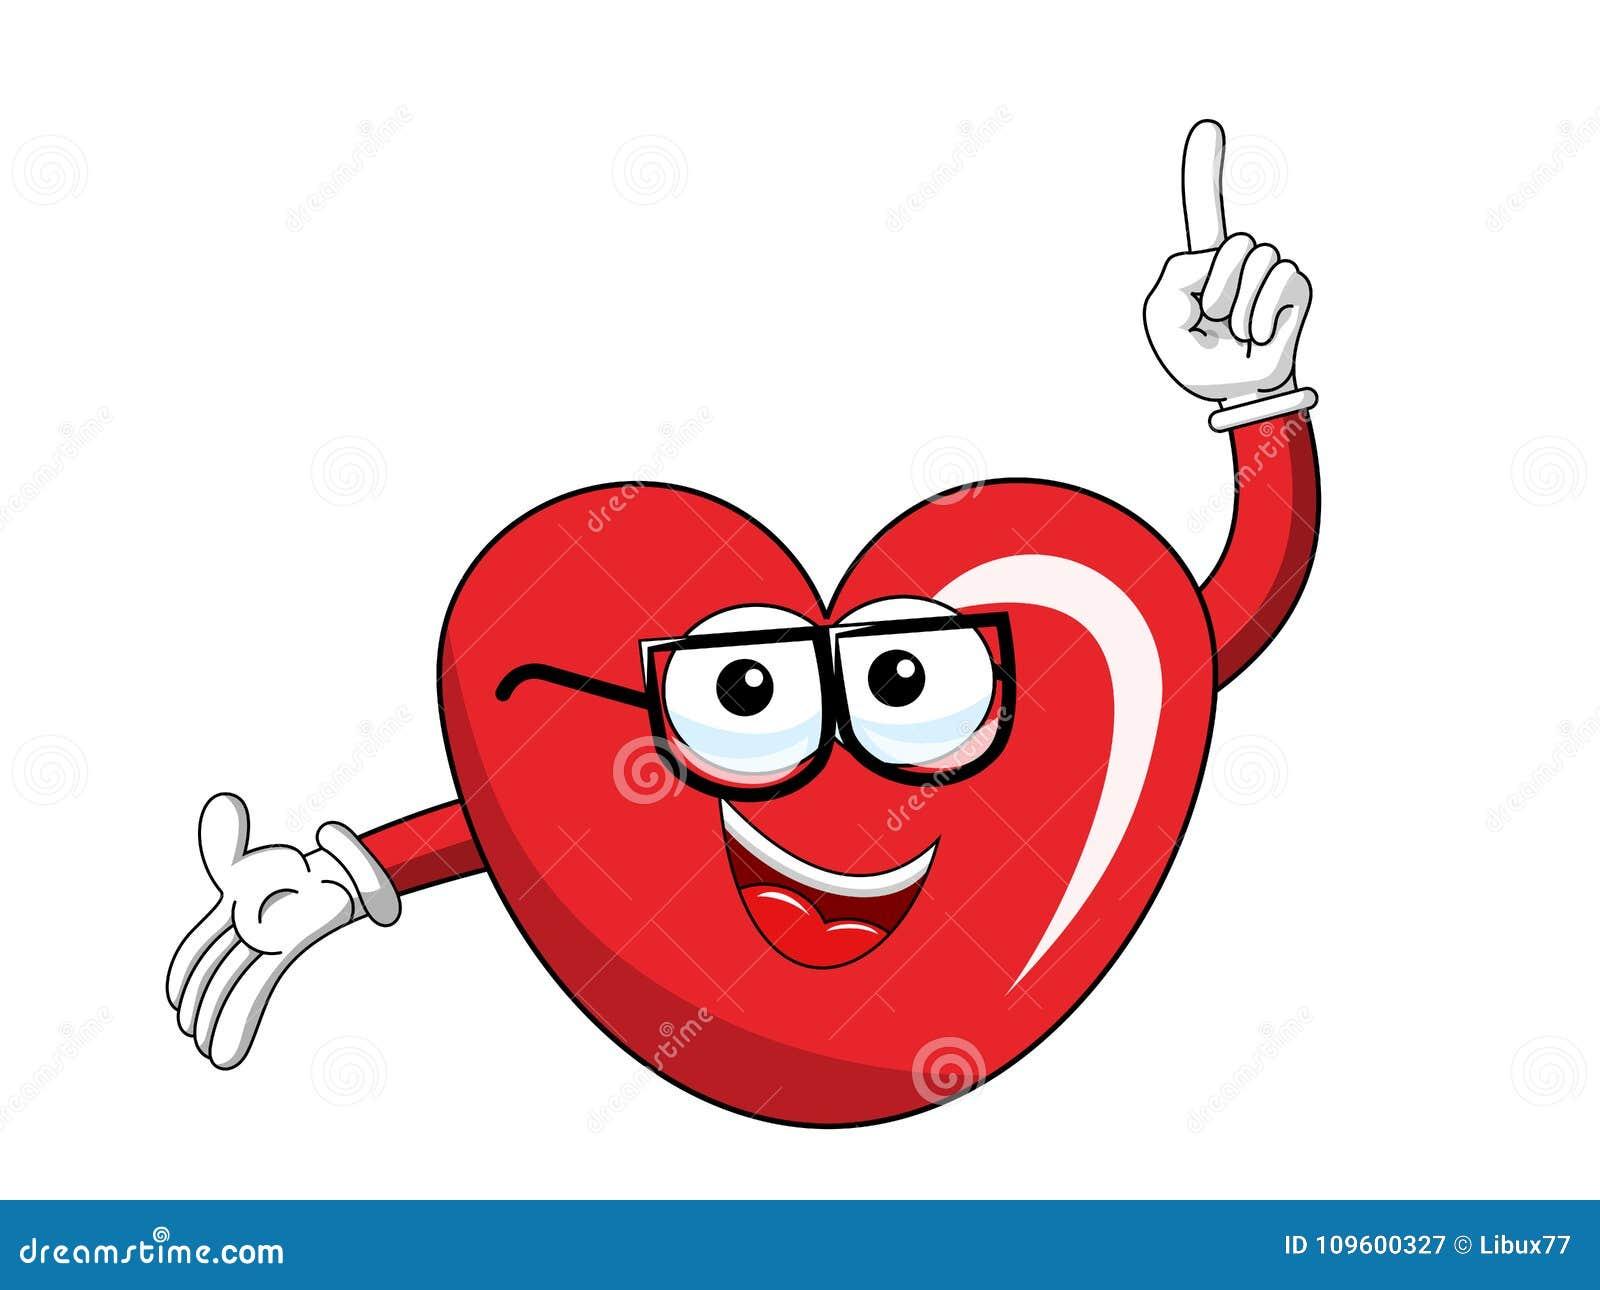 Cartoon mascot heart glasses finger up isolated